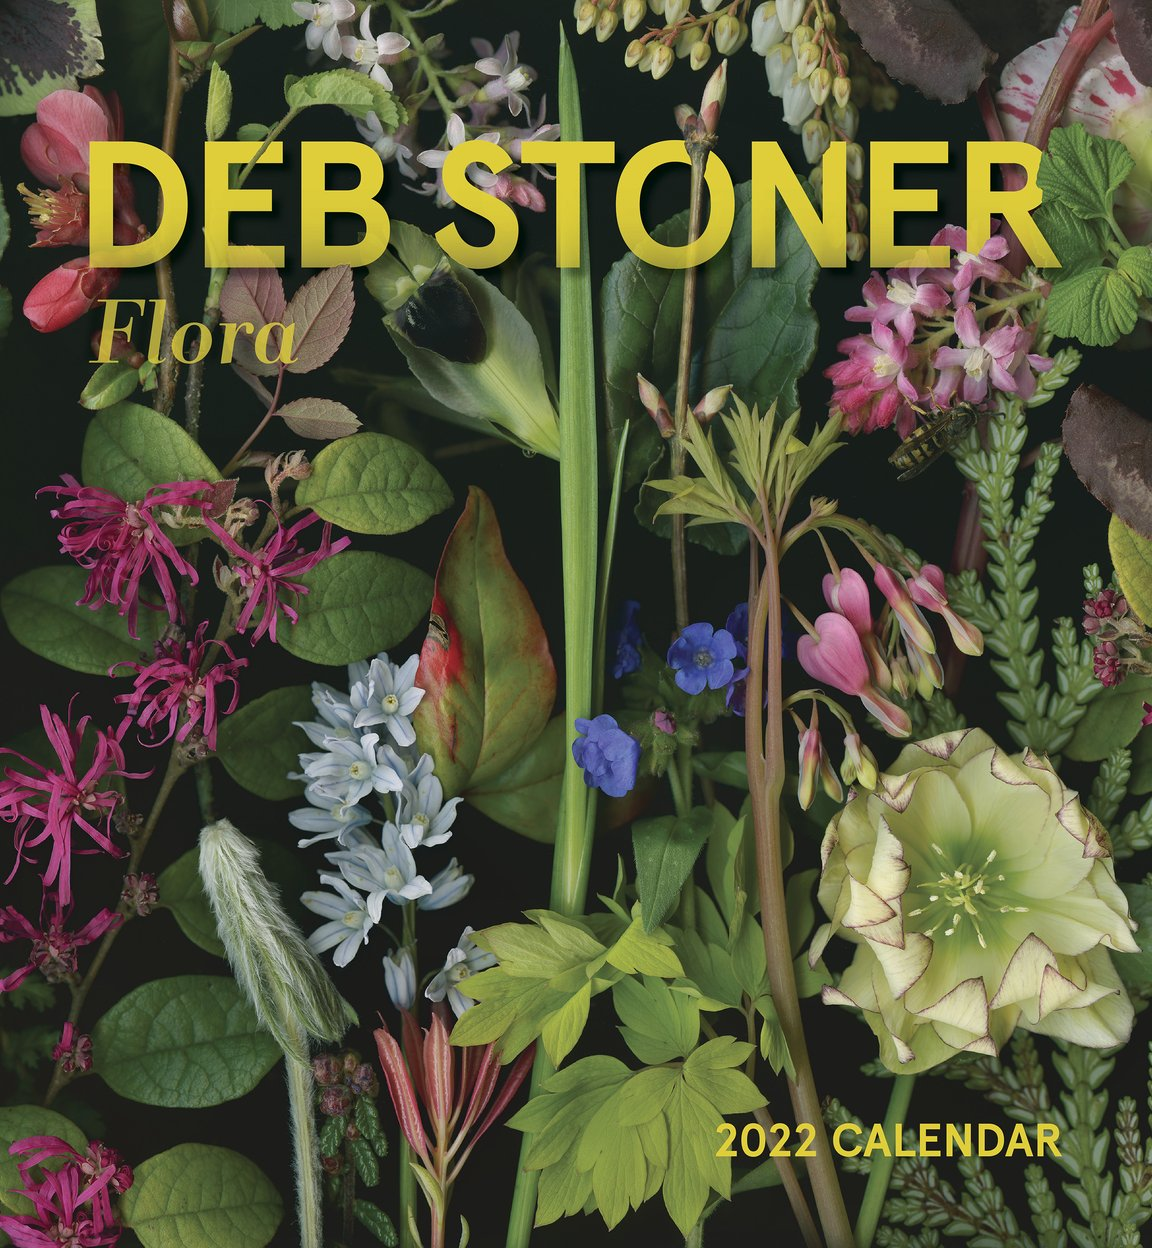 Stoner Flora 2022 Calendar